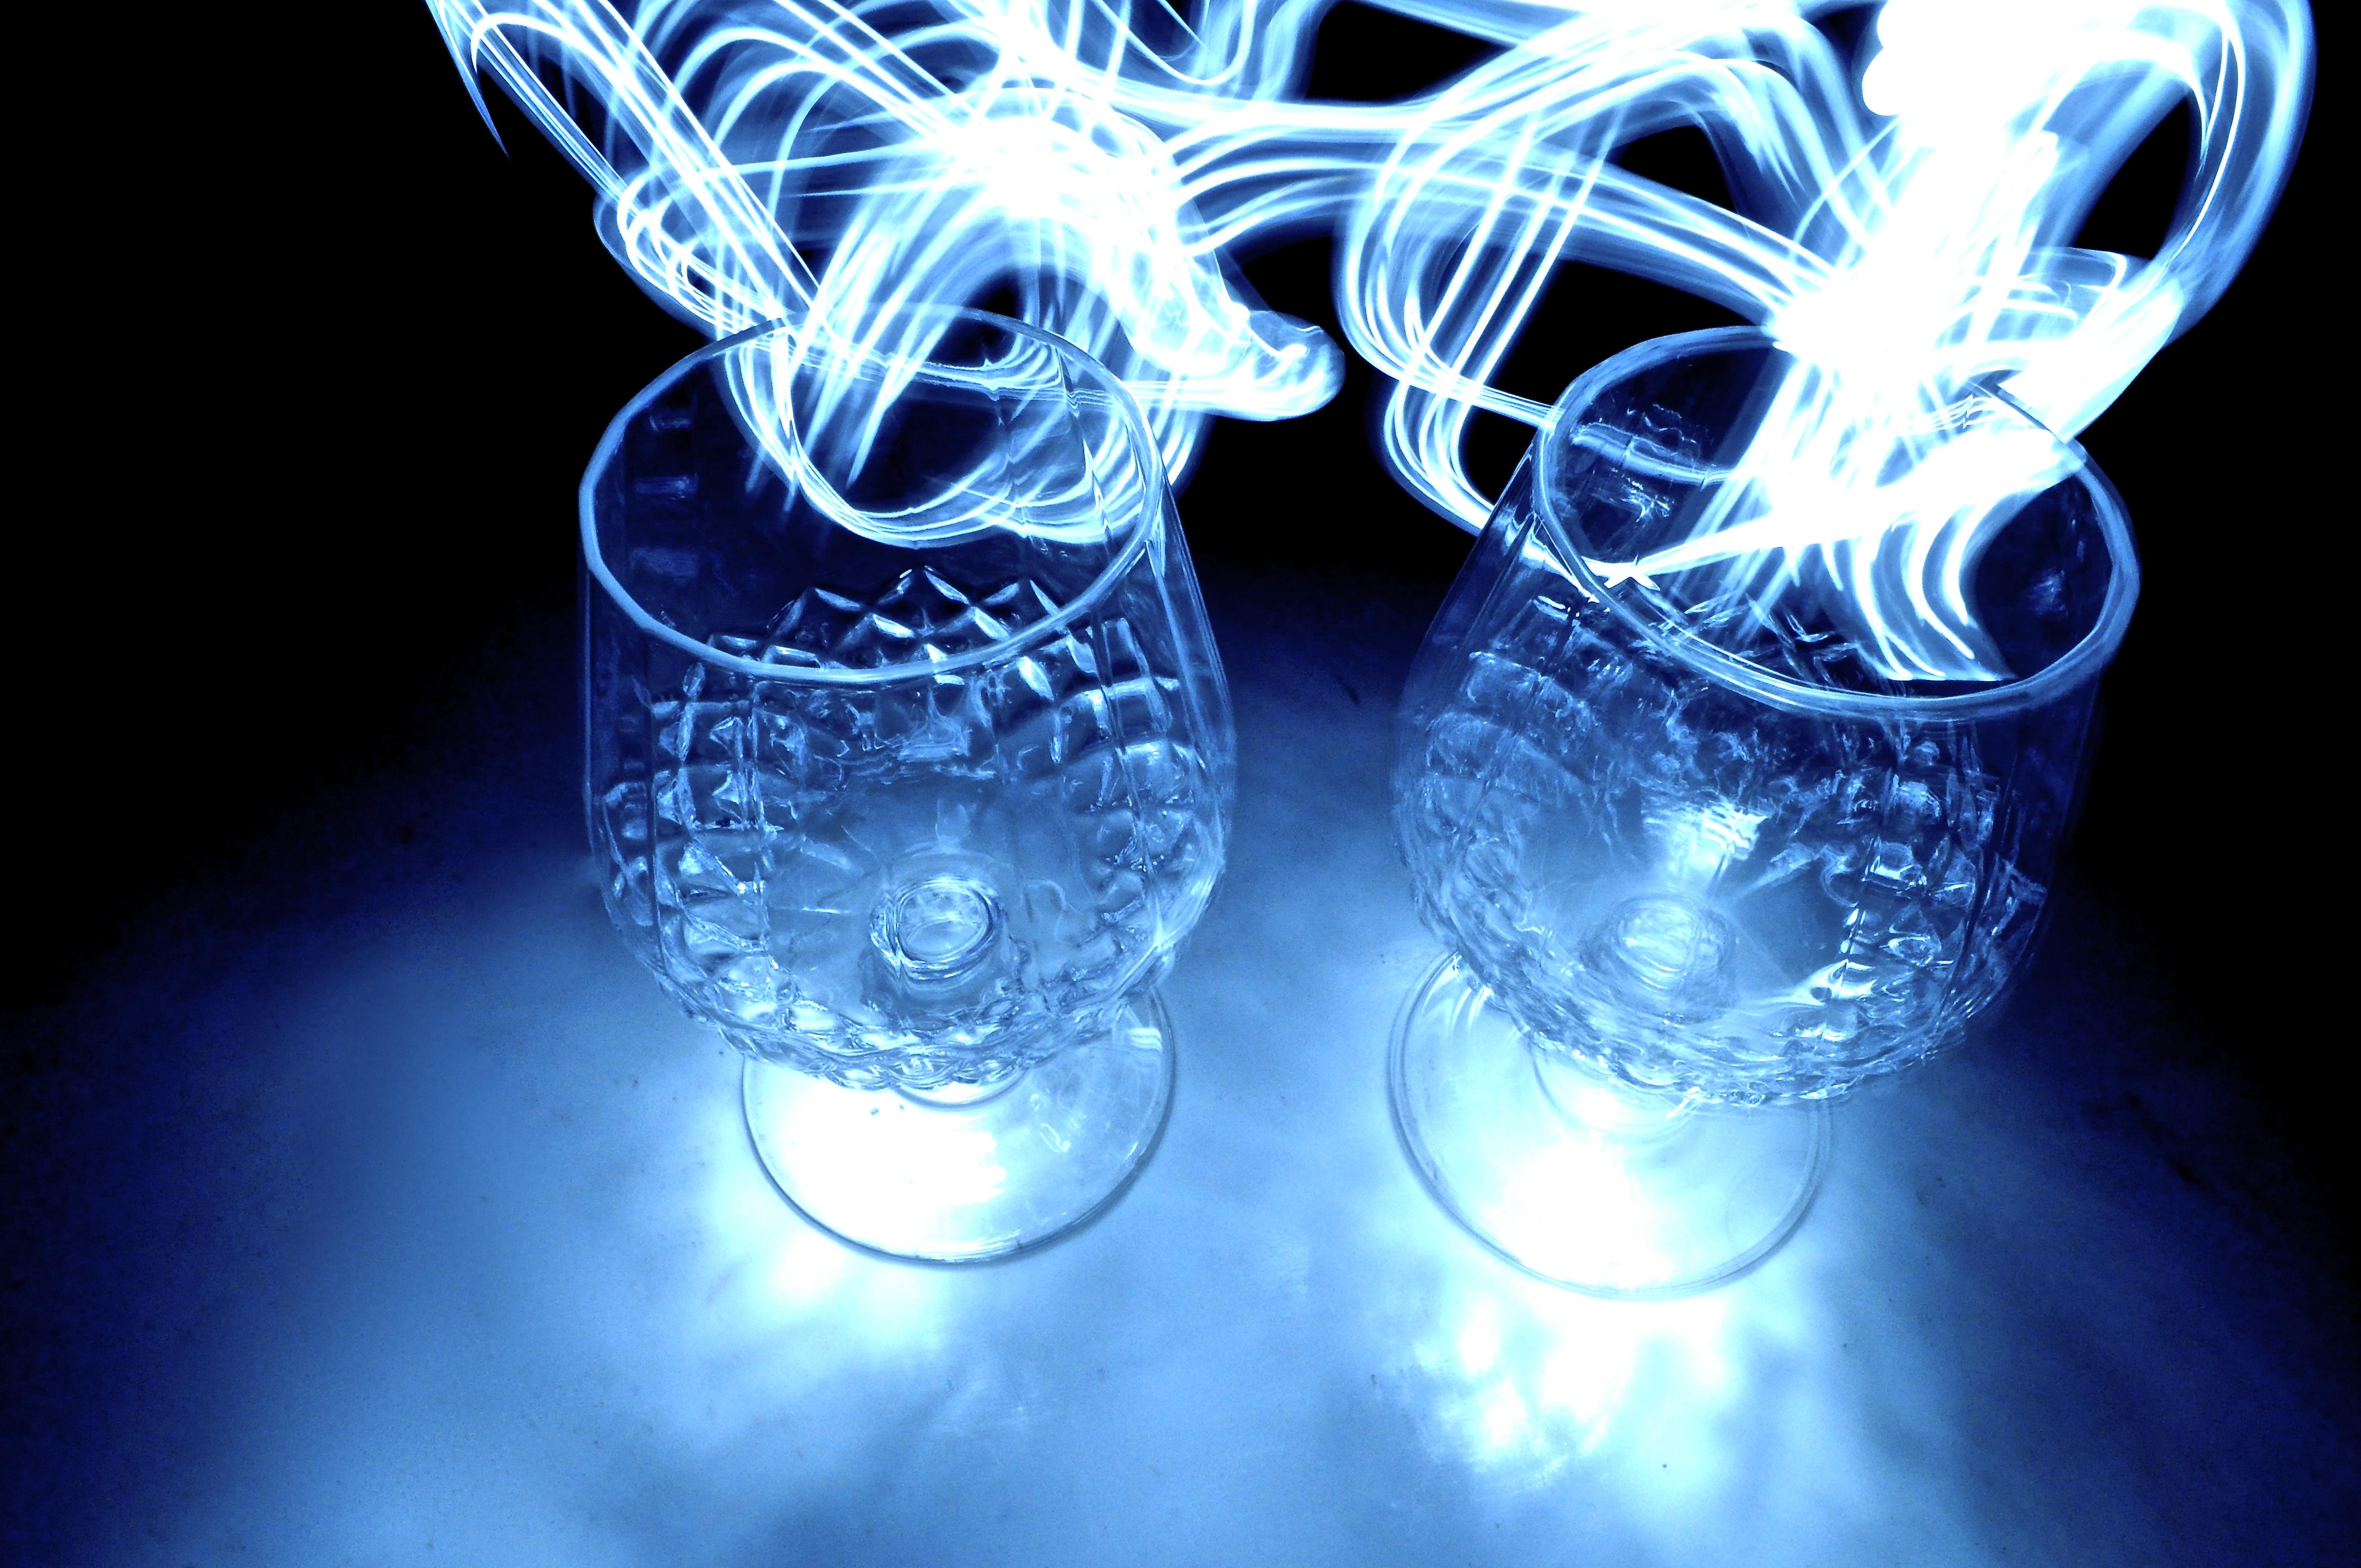 Light Trails - Wine Glasses